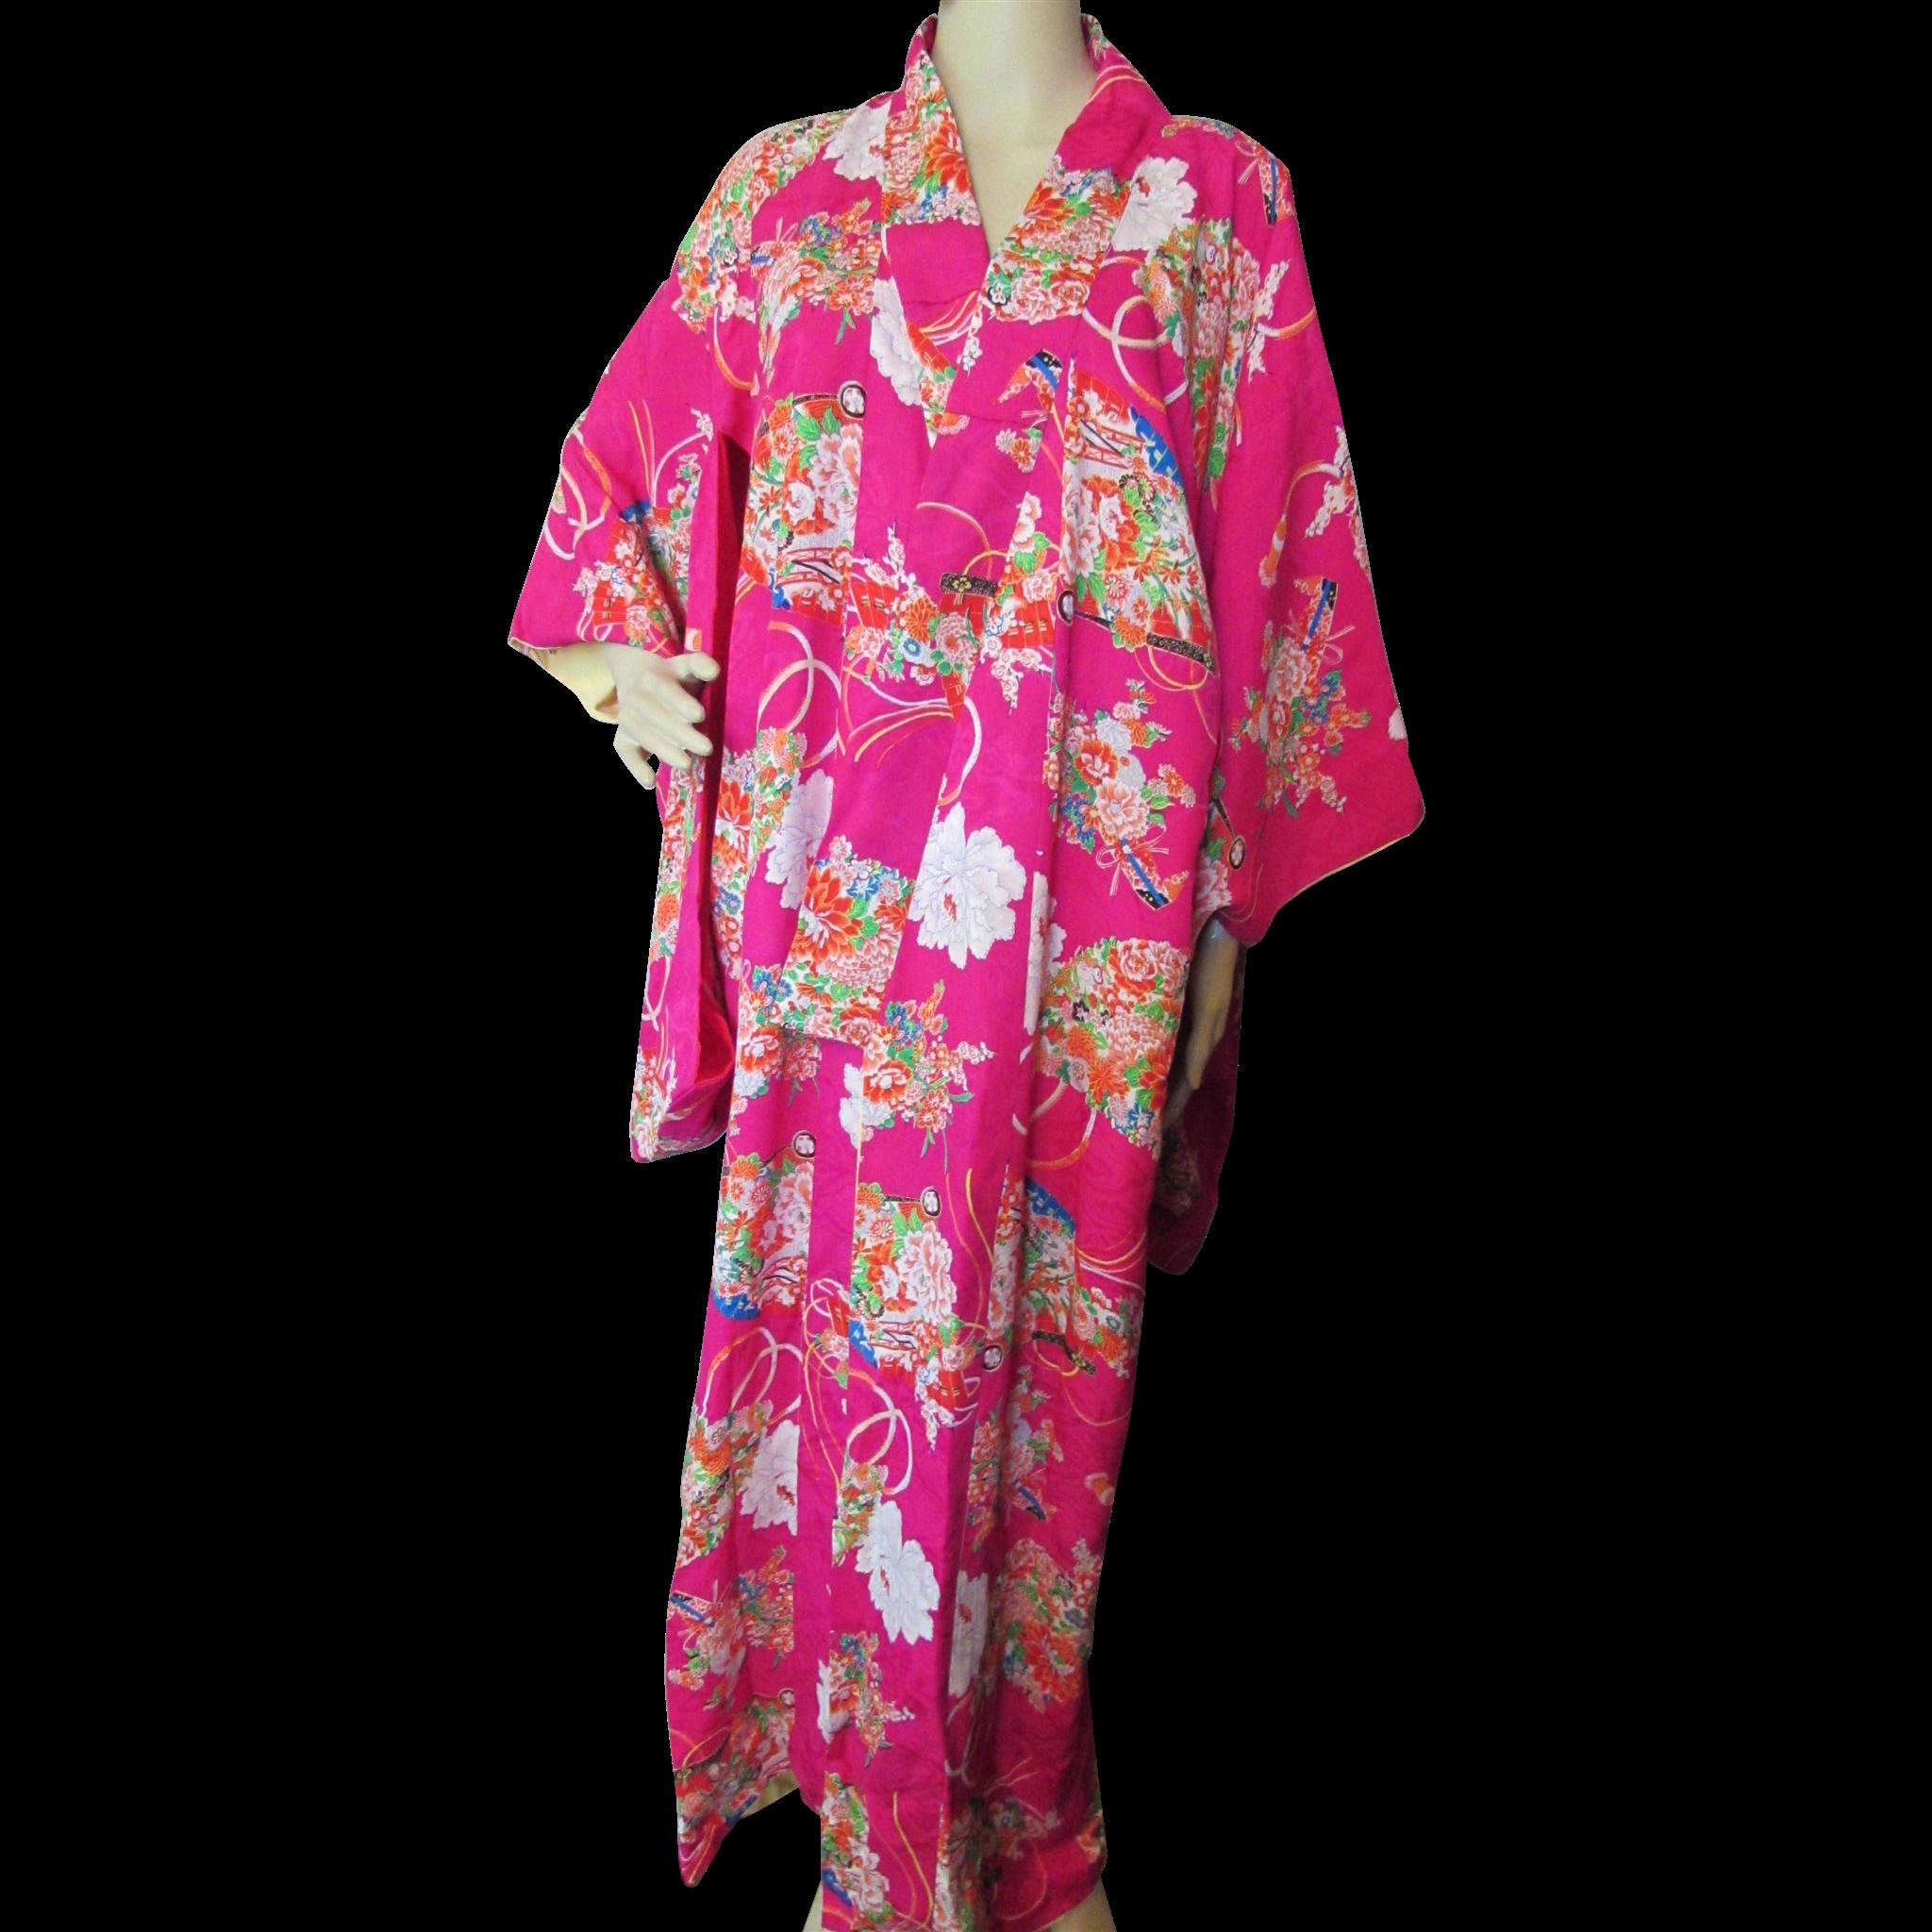 Asian Influence Kimono Robe in Fuchsia Pink and Fan Design